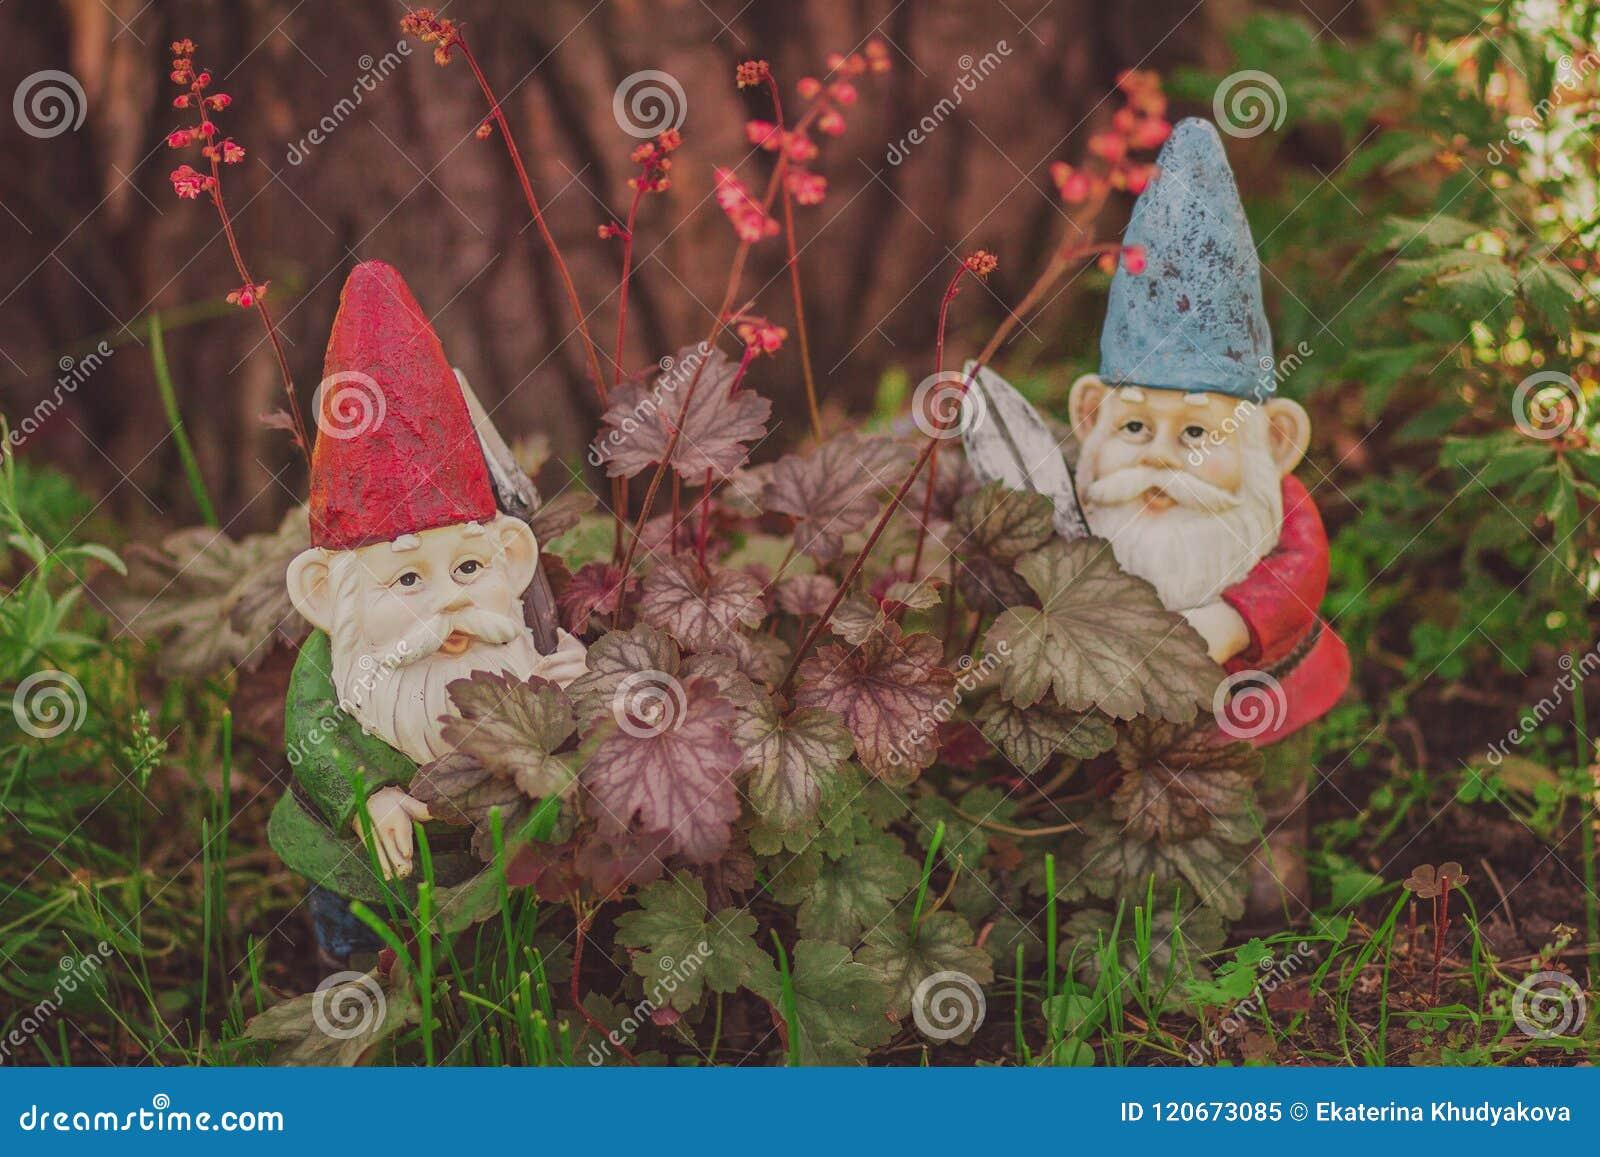 Cute Gnomes Garden Model, Gardener With Scissors Stock Image - Image ...